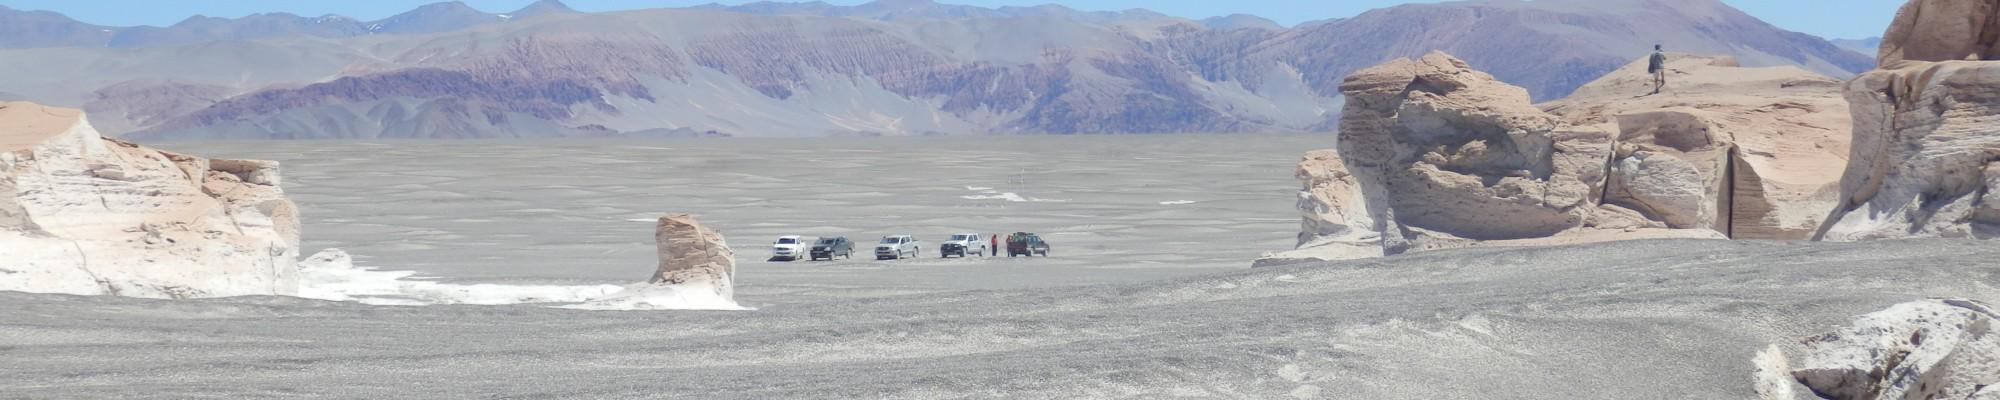 Puna jeep tour